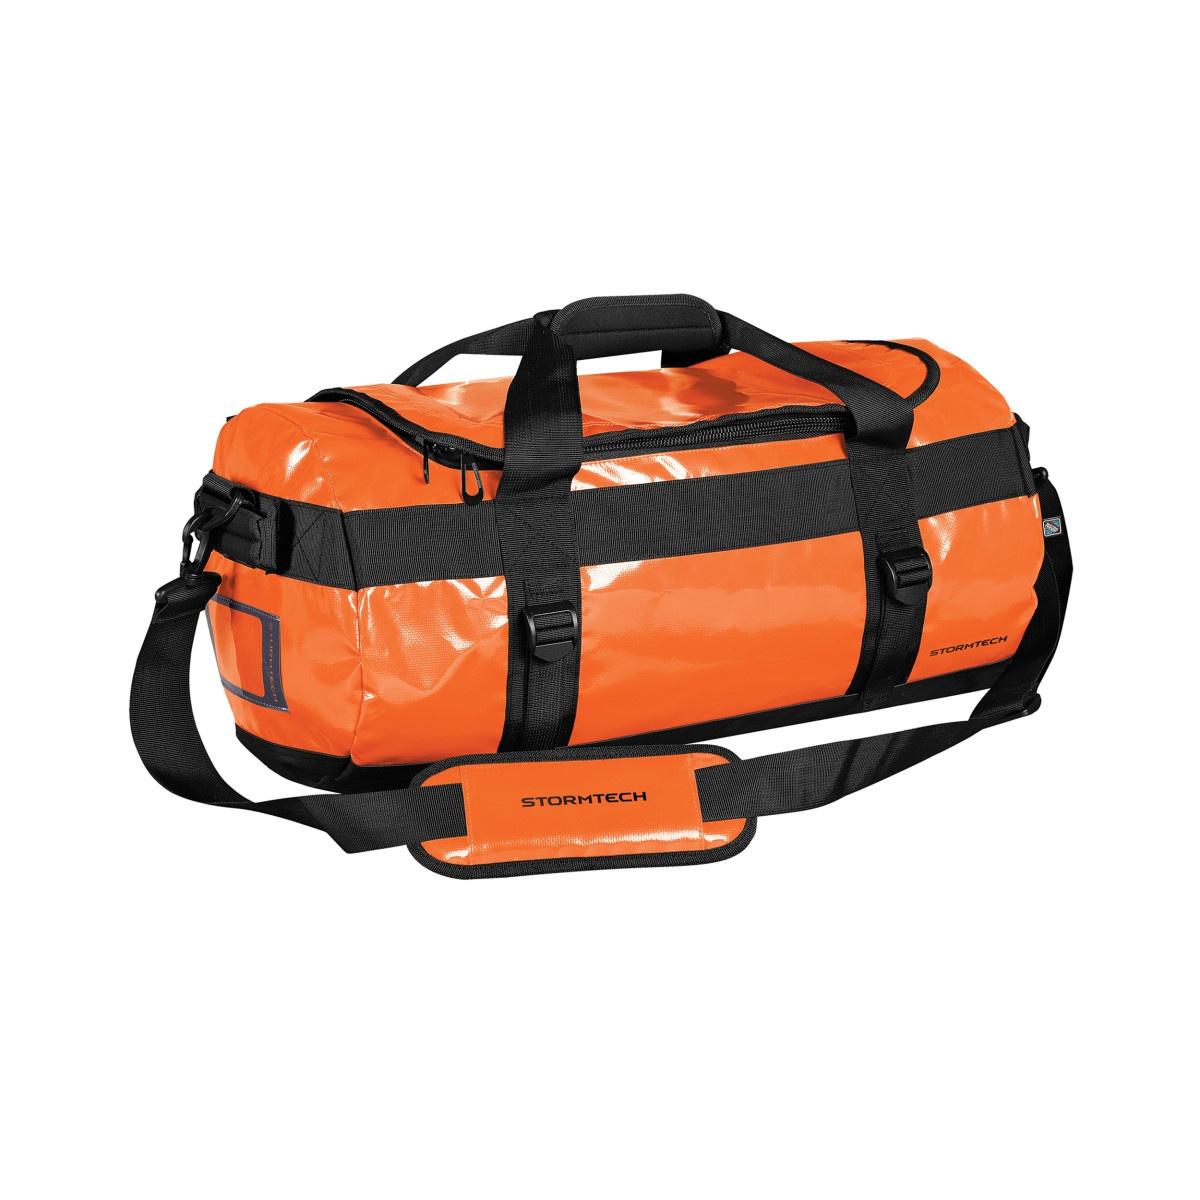 Stormtech Waterproof Gear Holdall Bag (Small) (One Size) (Ocean Blue/Black)